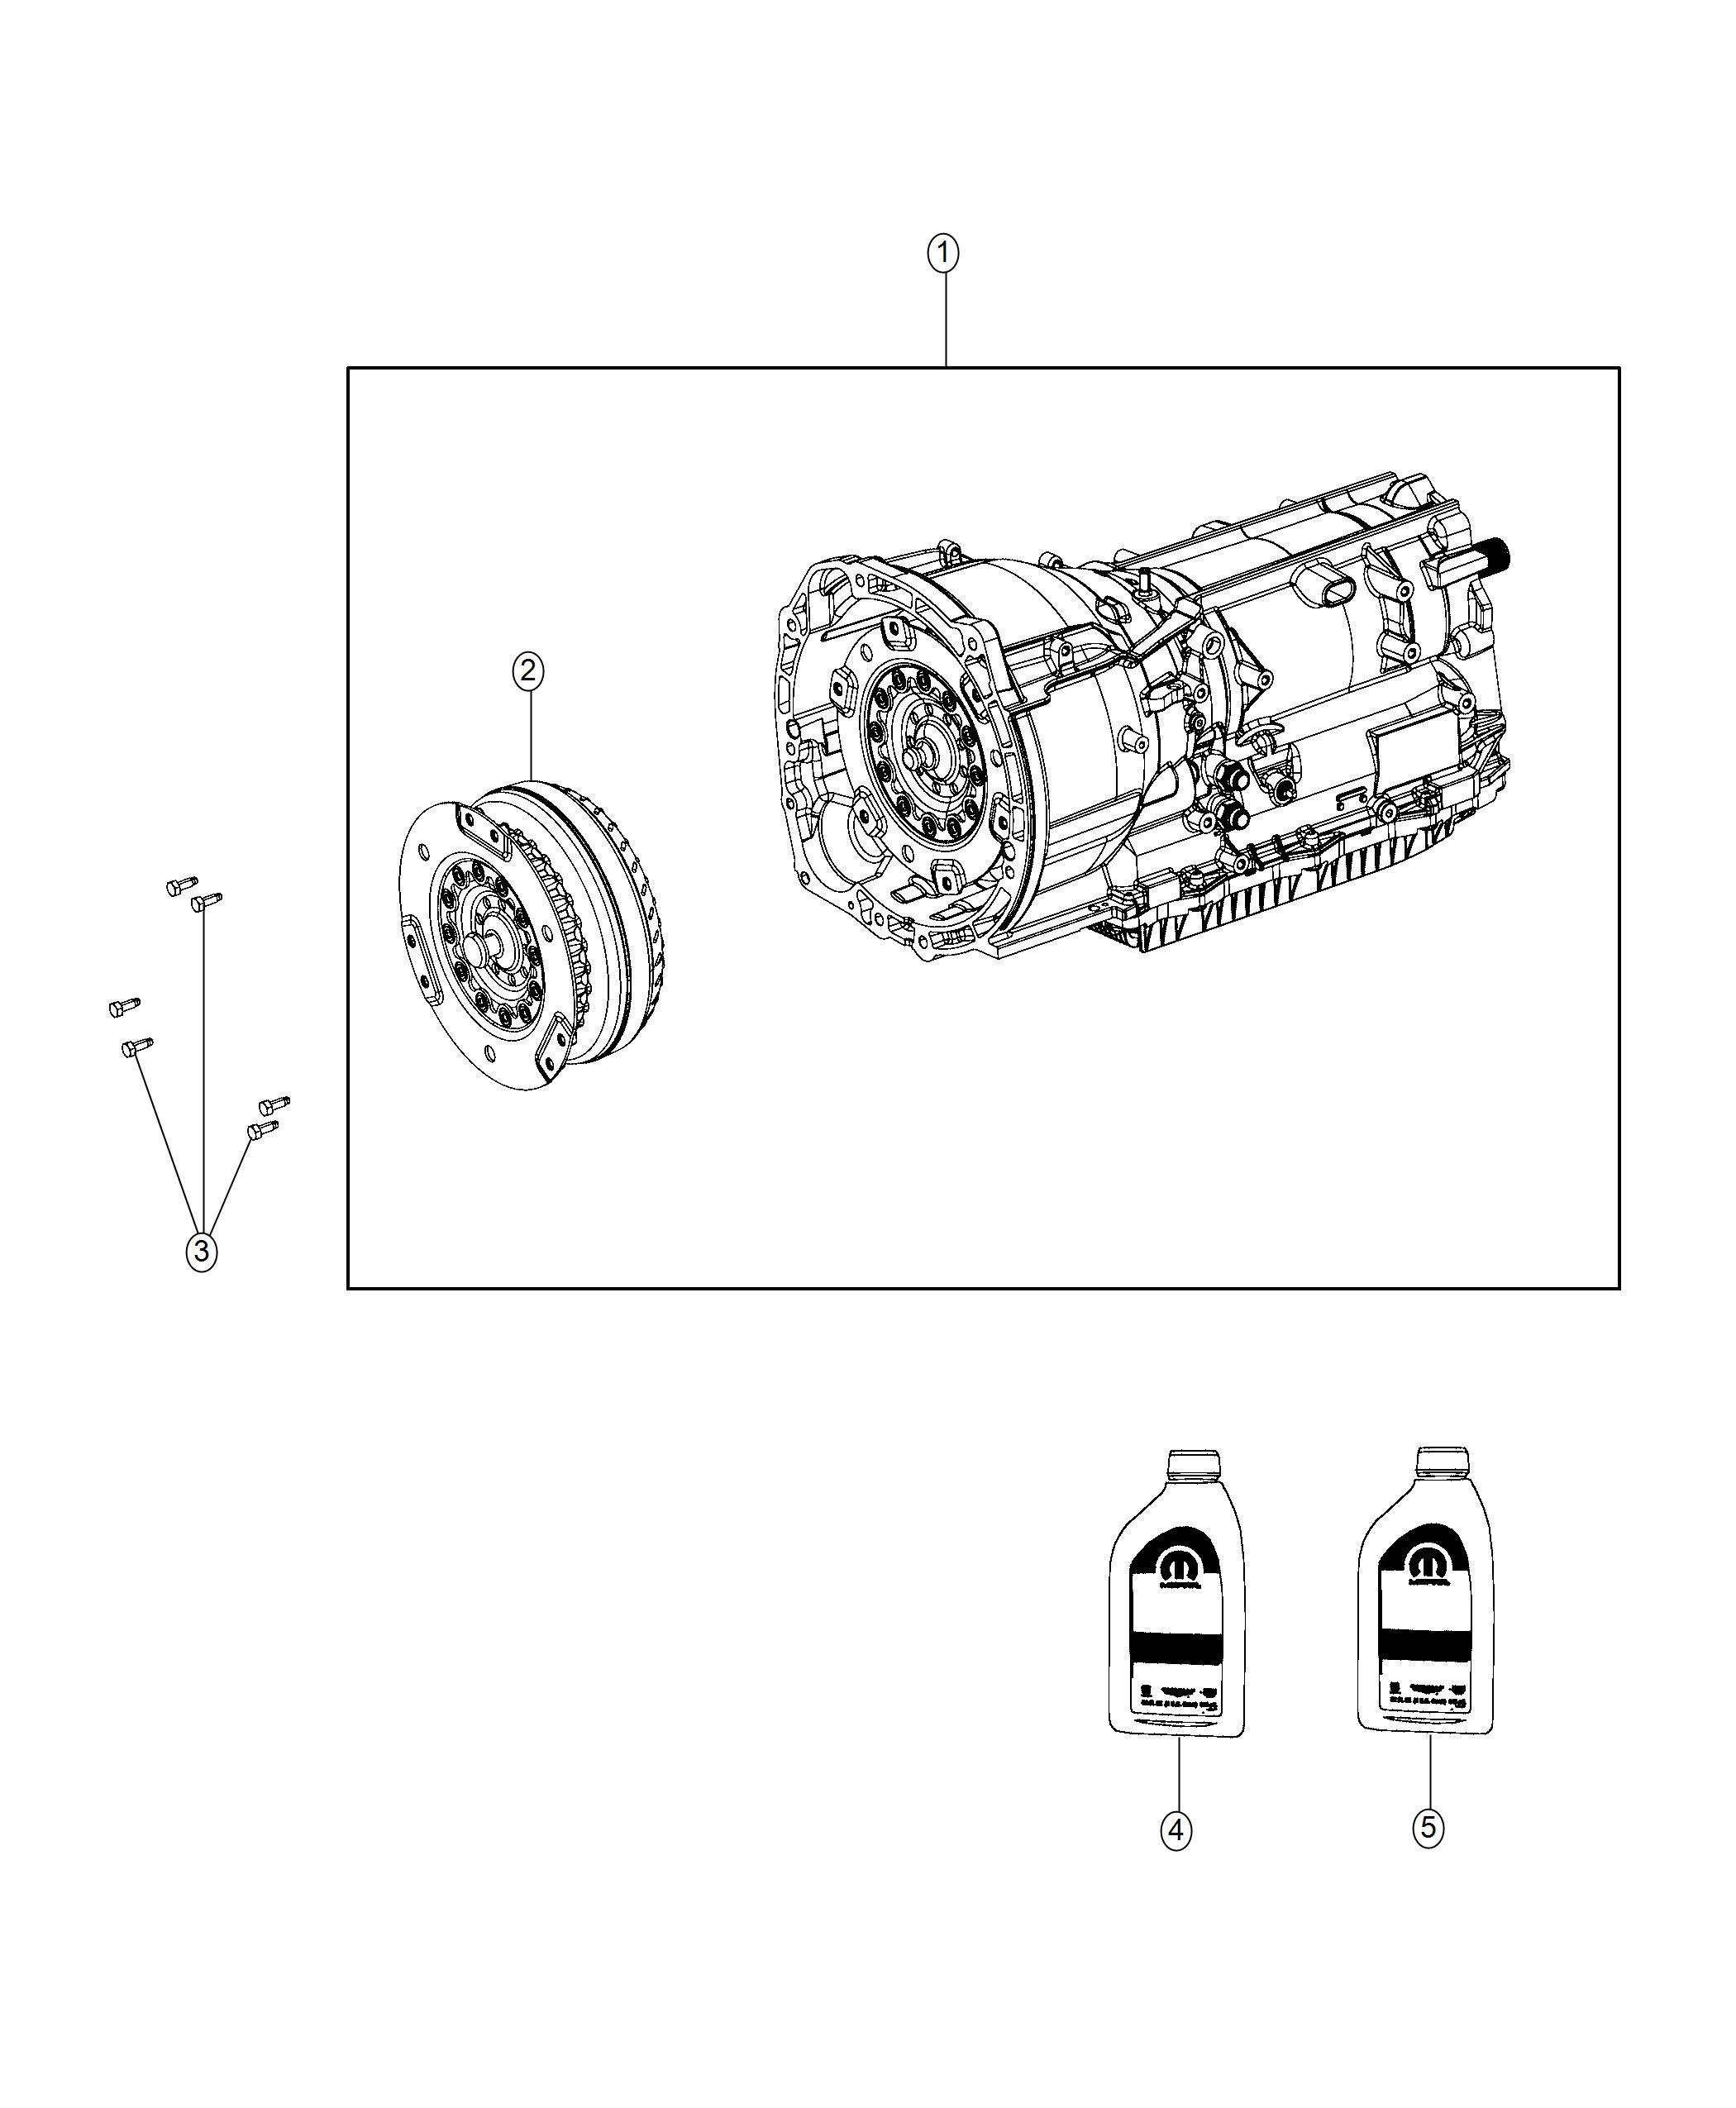 Jeep Wrangler Bolt. Hex flange head. M8x1.25x20.00